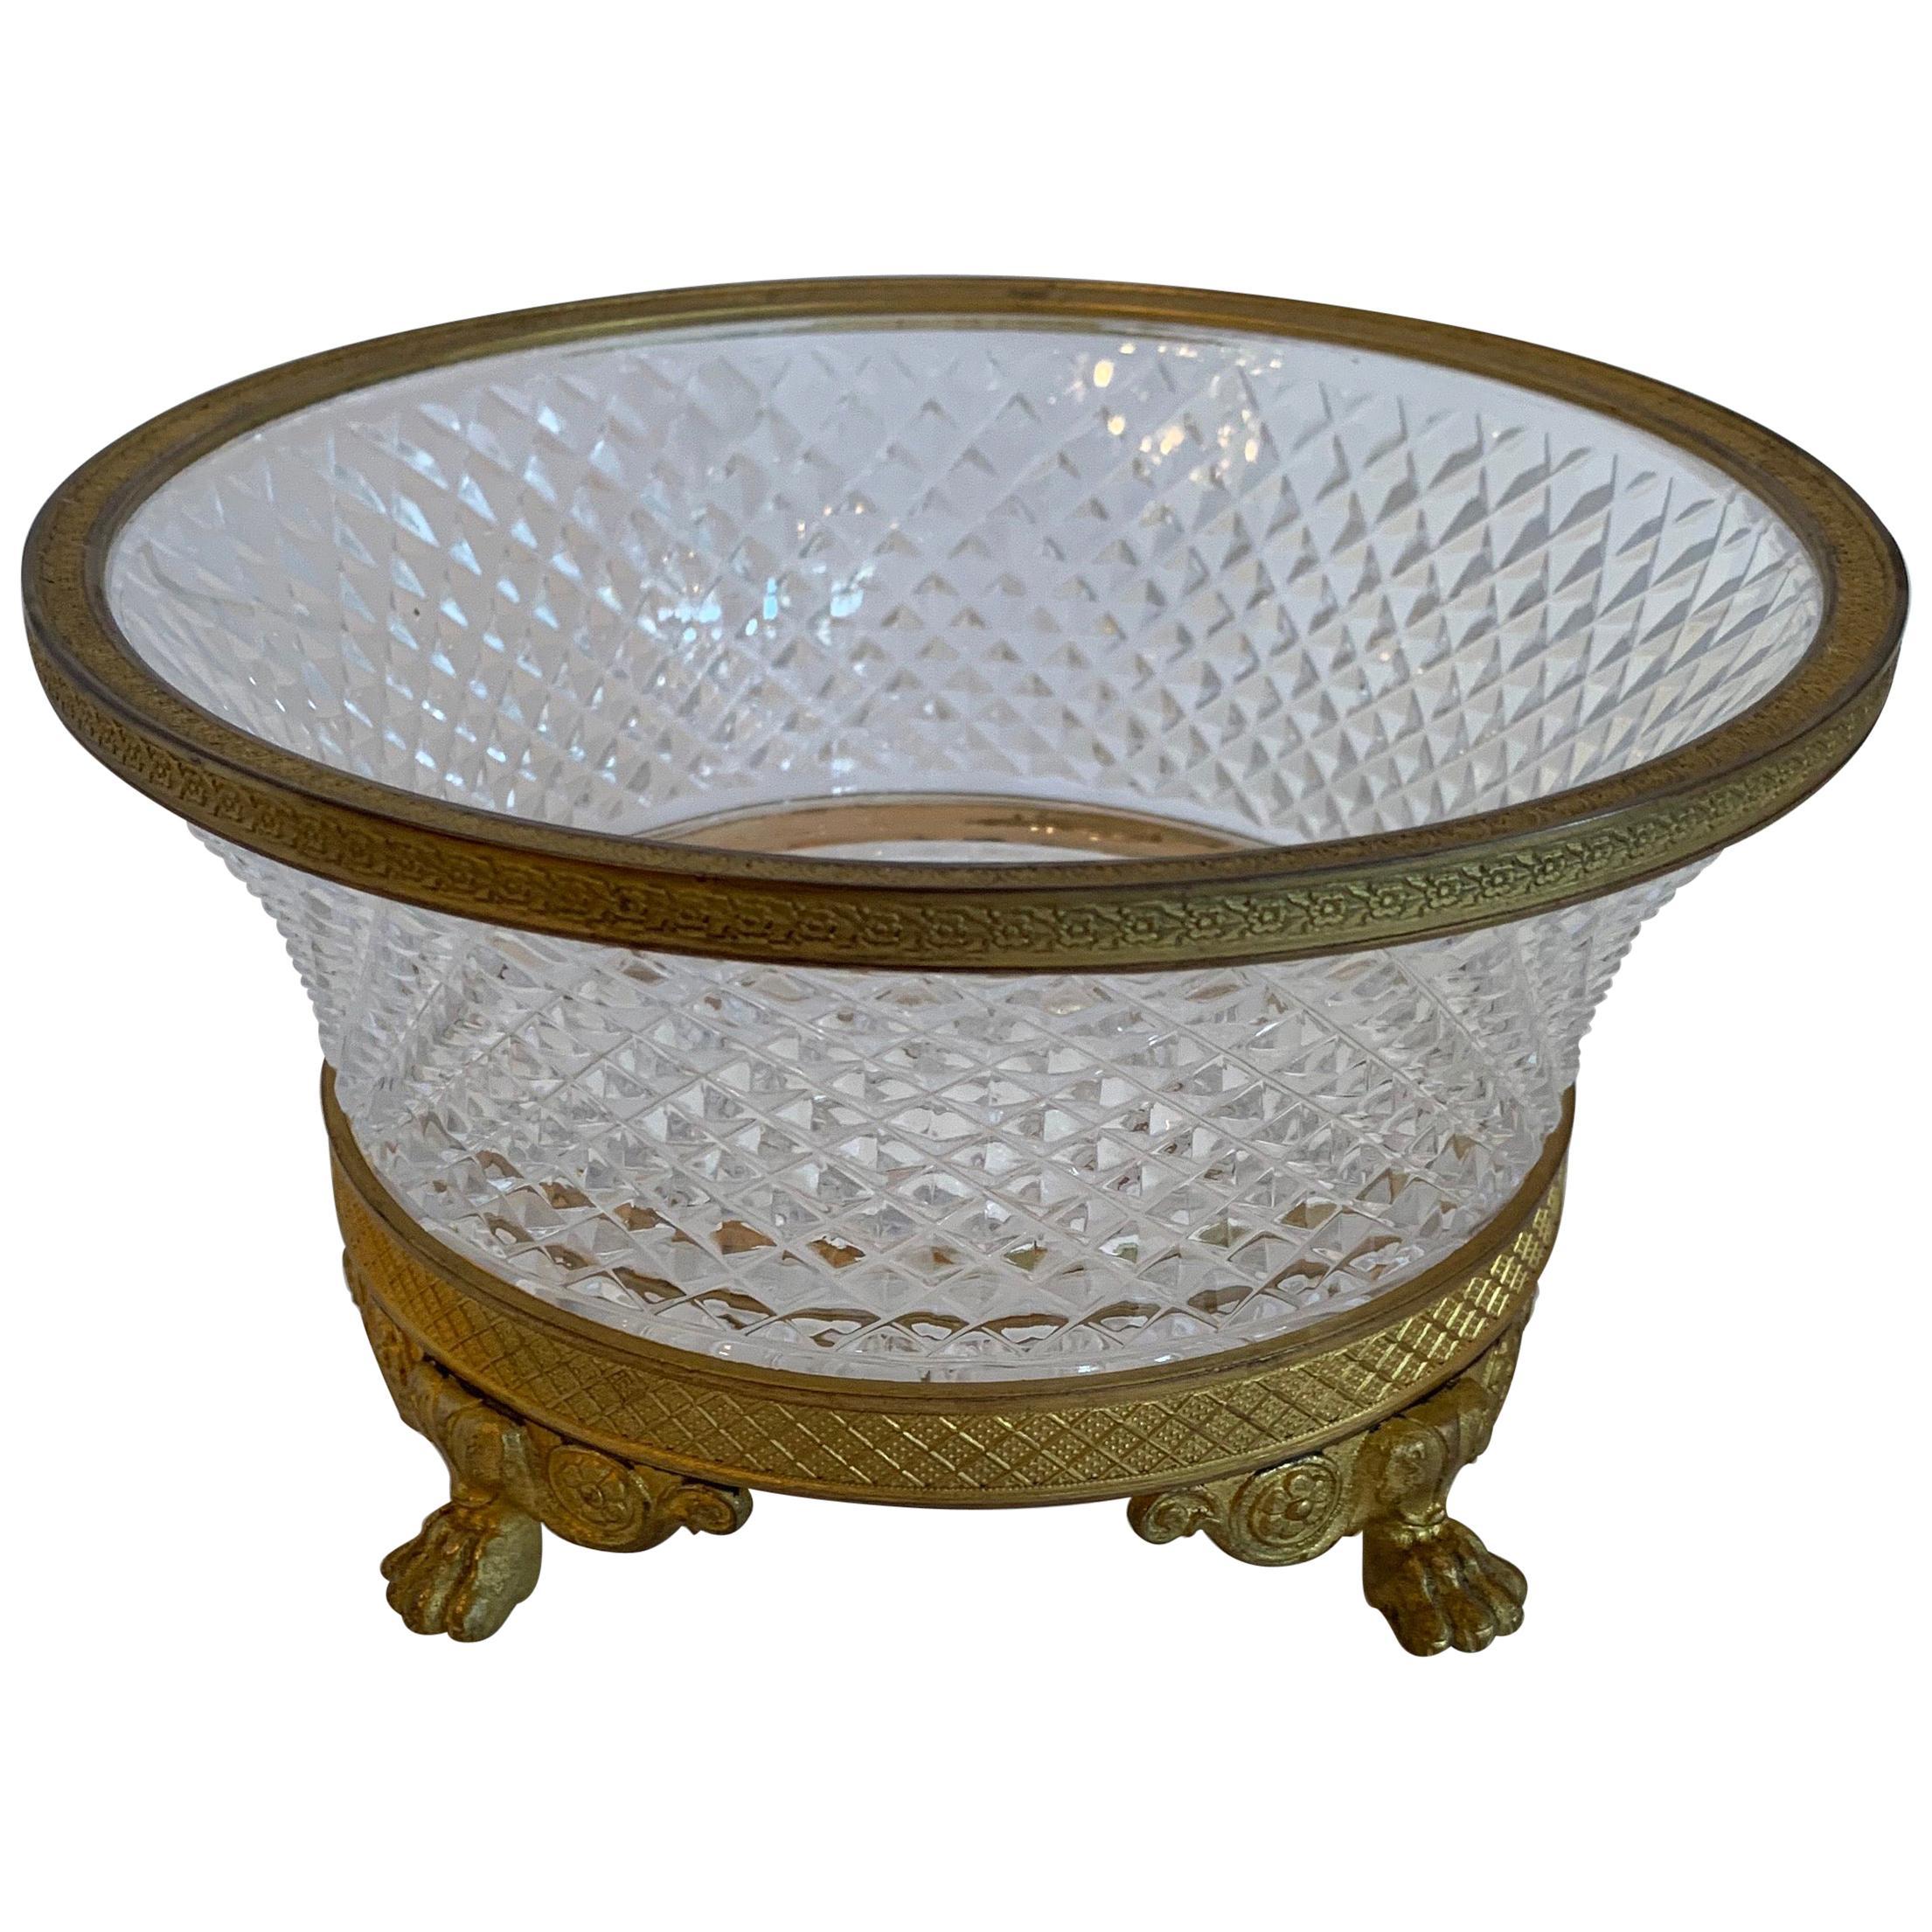 Wonderful French Empire Gilt Doré Bronze & Cut Crystal Round Centerpiece Bowl